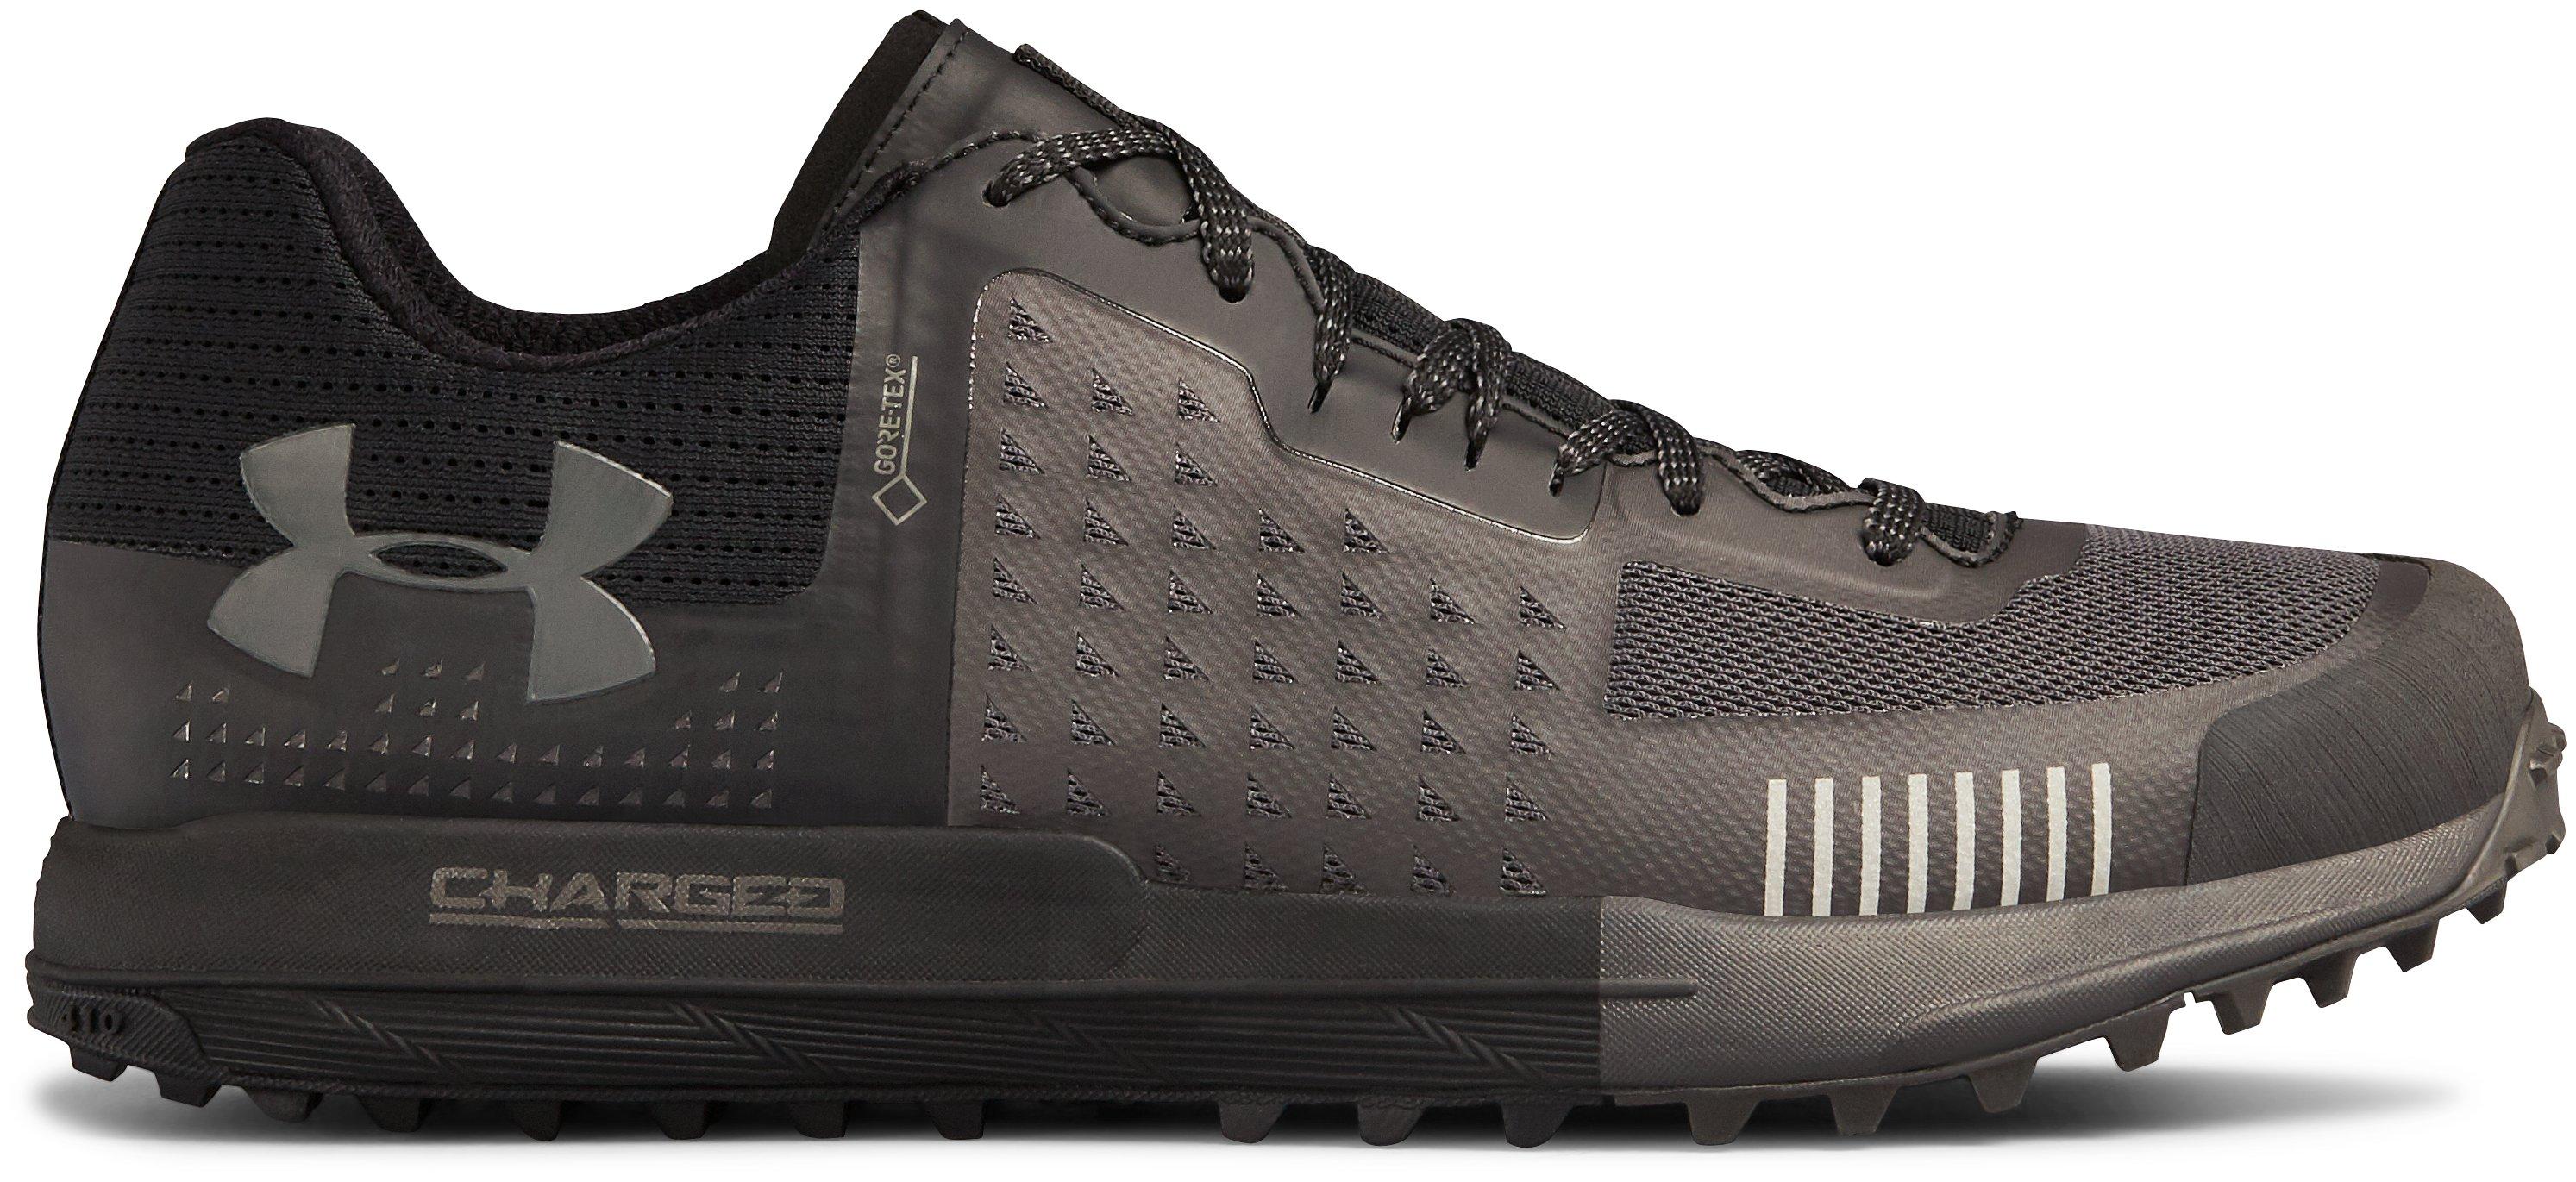 Men's UA Horizon RTT GTX Trail Running Shoes, 360 degree view